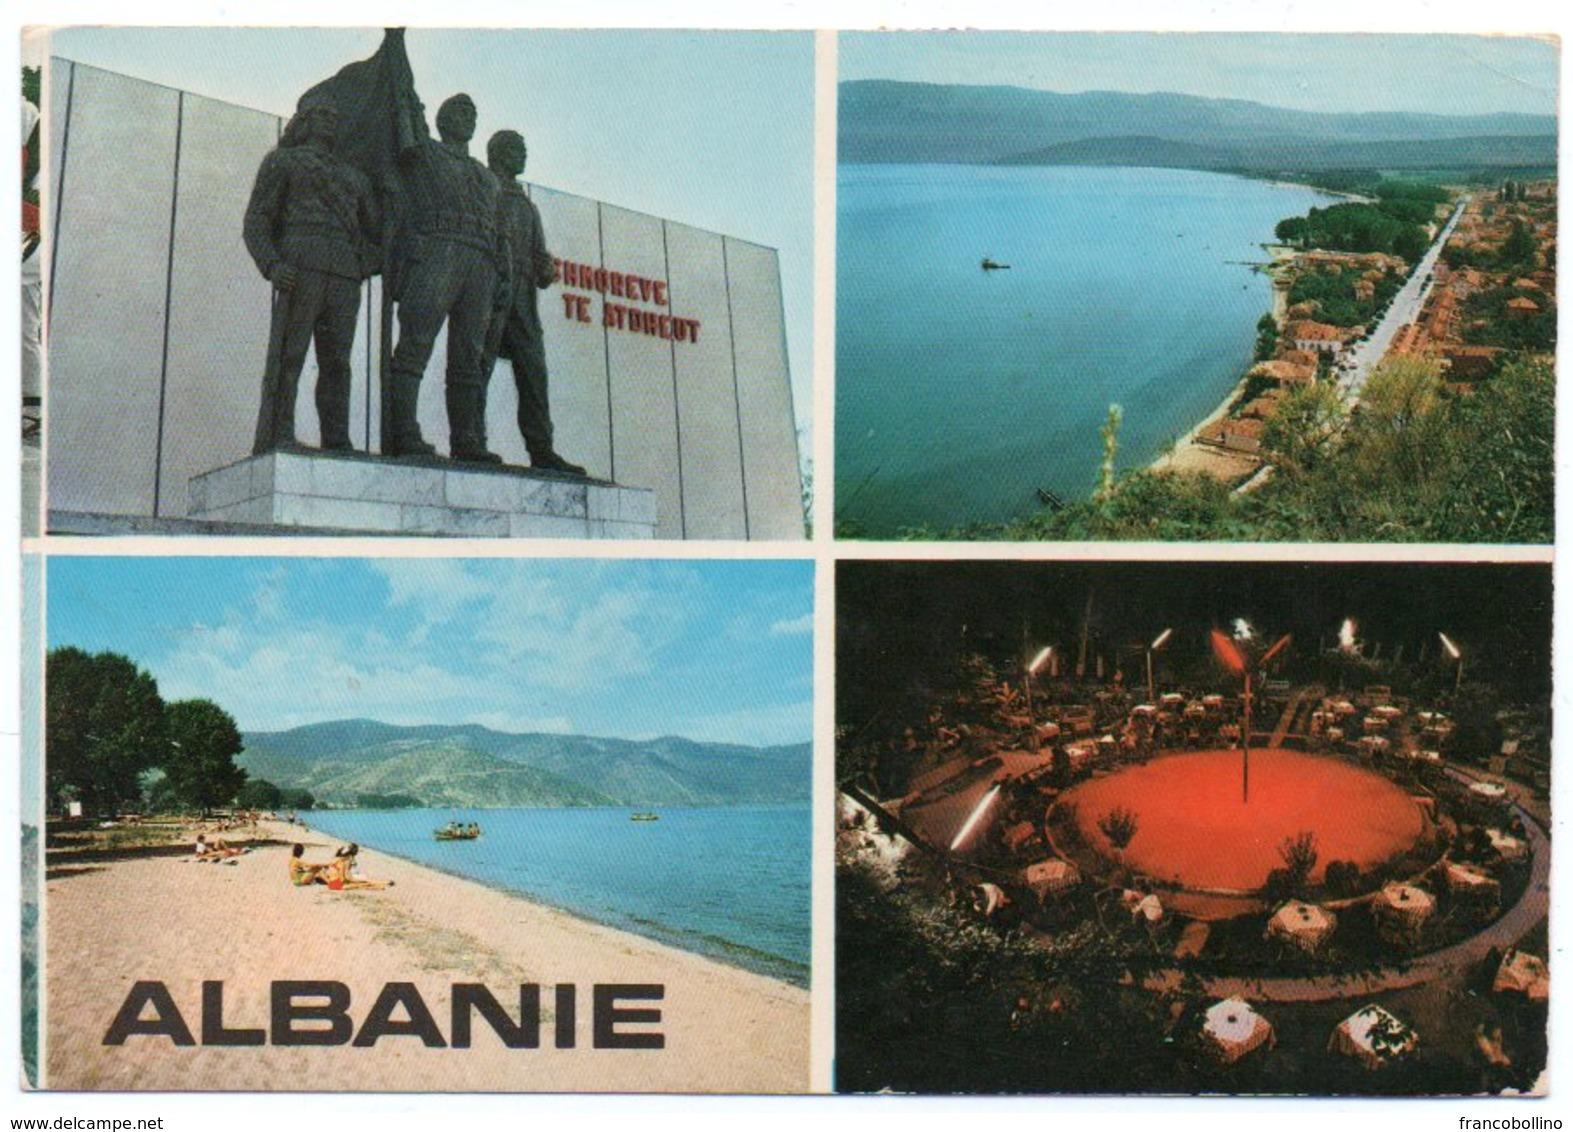 ALBANIE/ALBANIA - POGRADECI VIEWS / THEMATIC STAMPS-FLOWERS - Albania